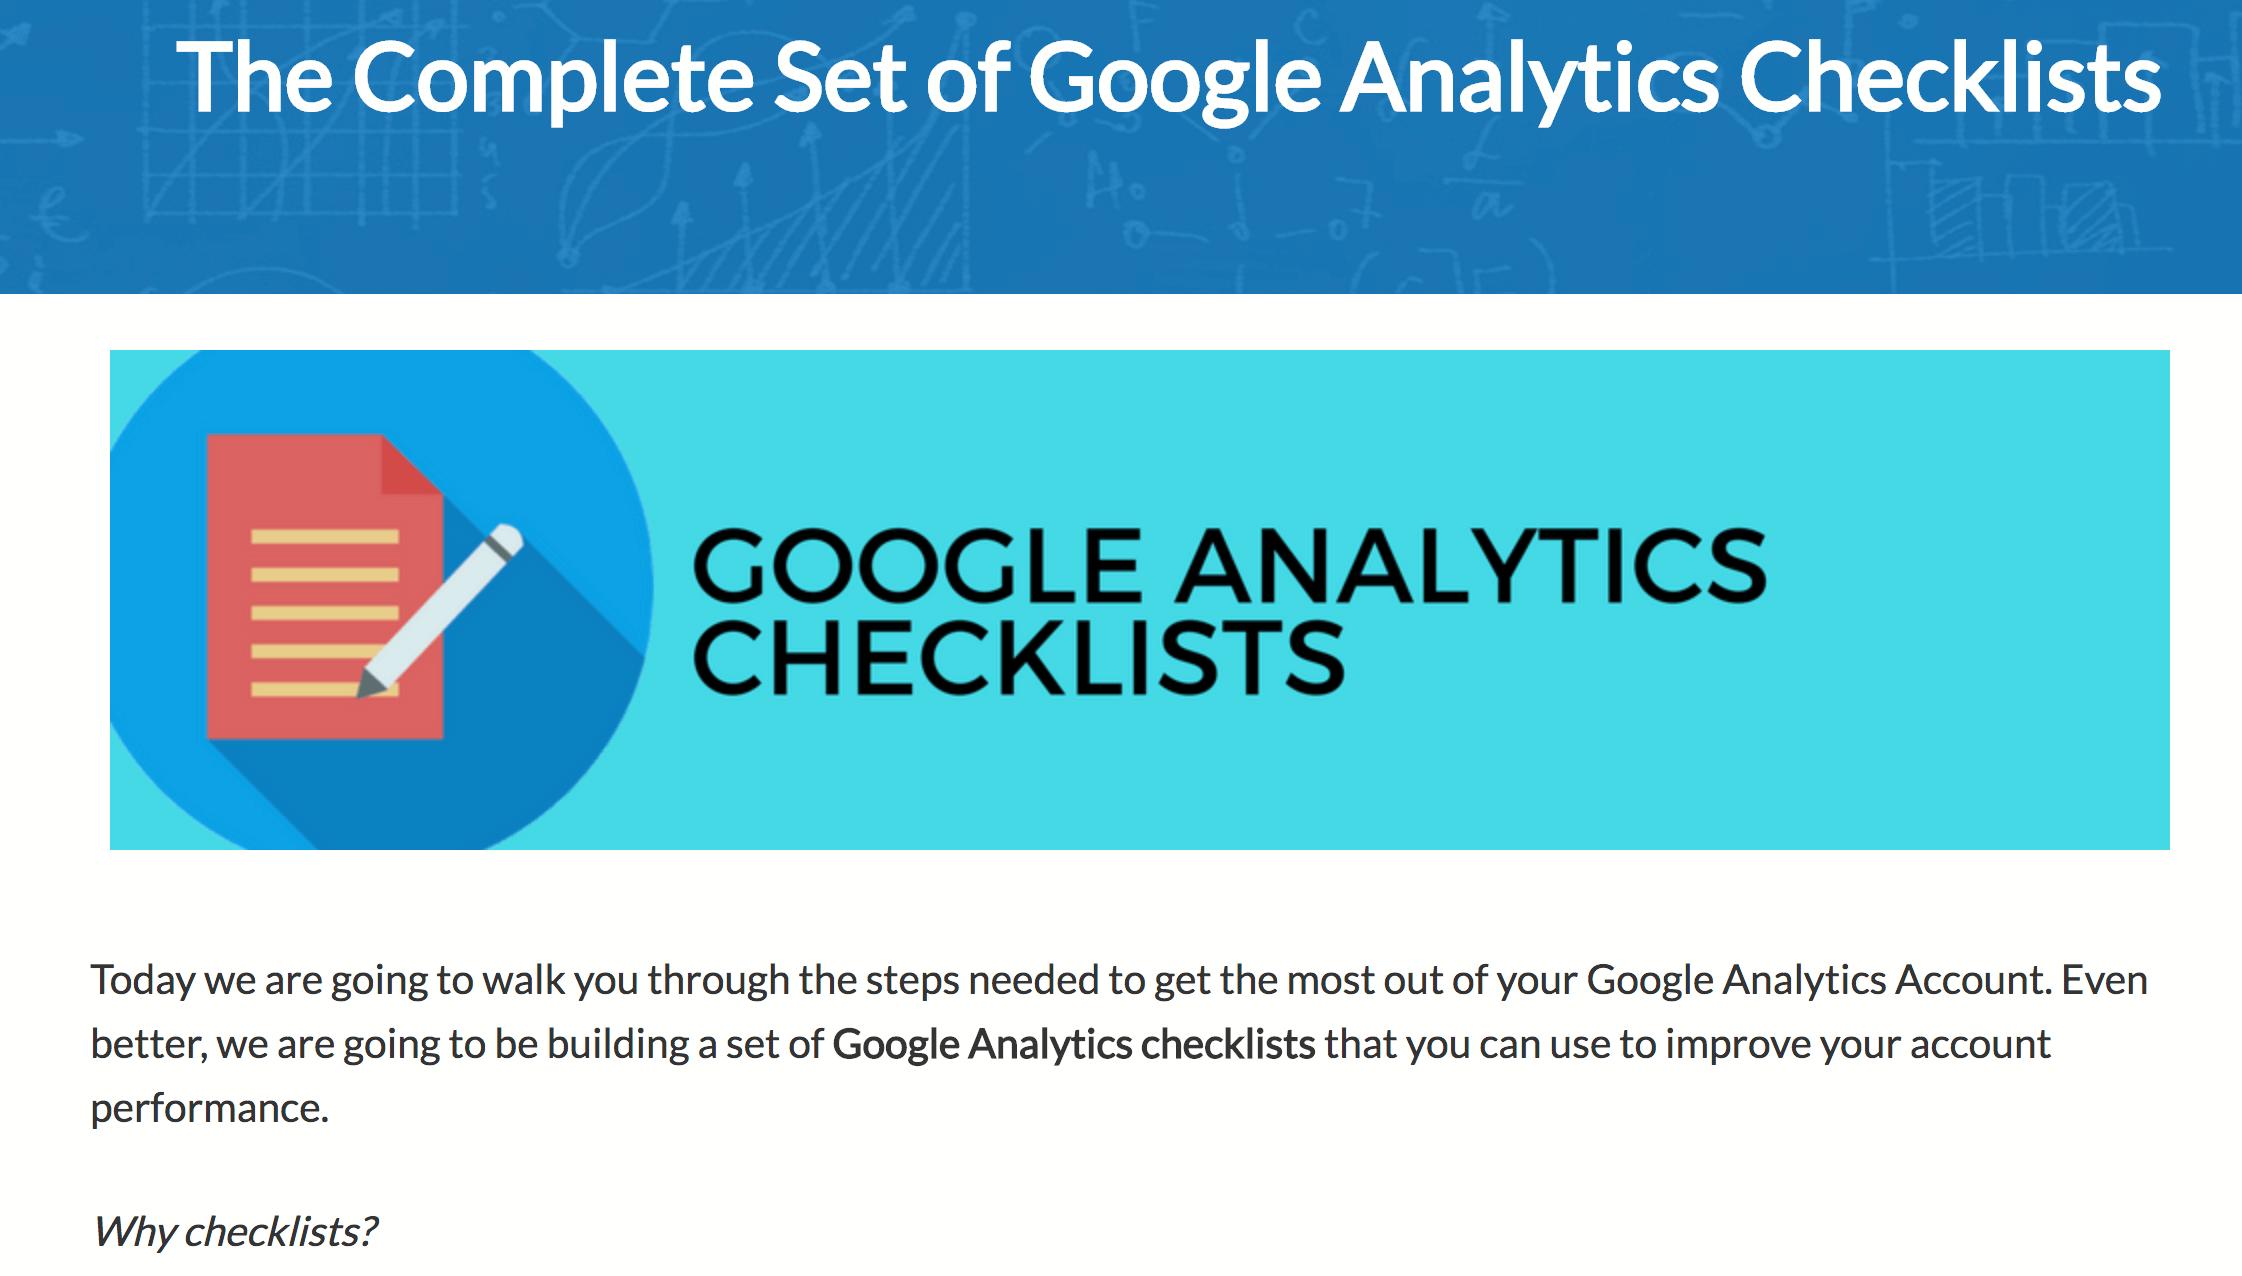 Google Analytics checklists